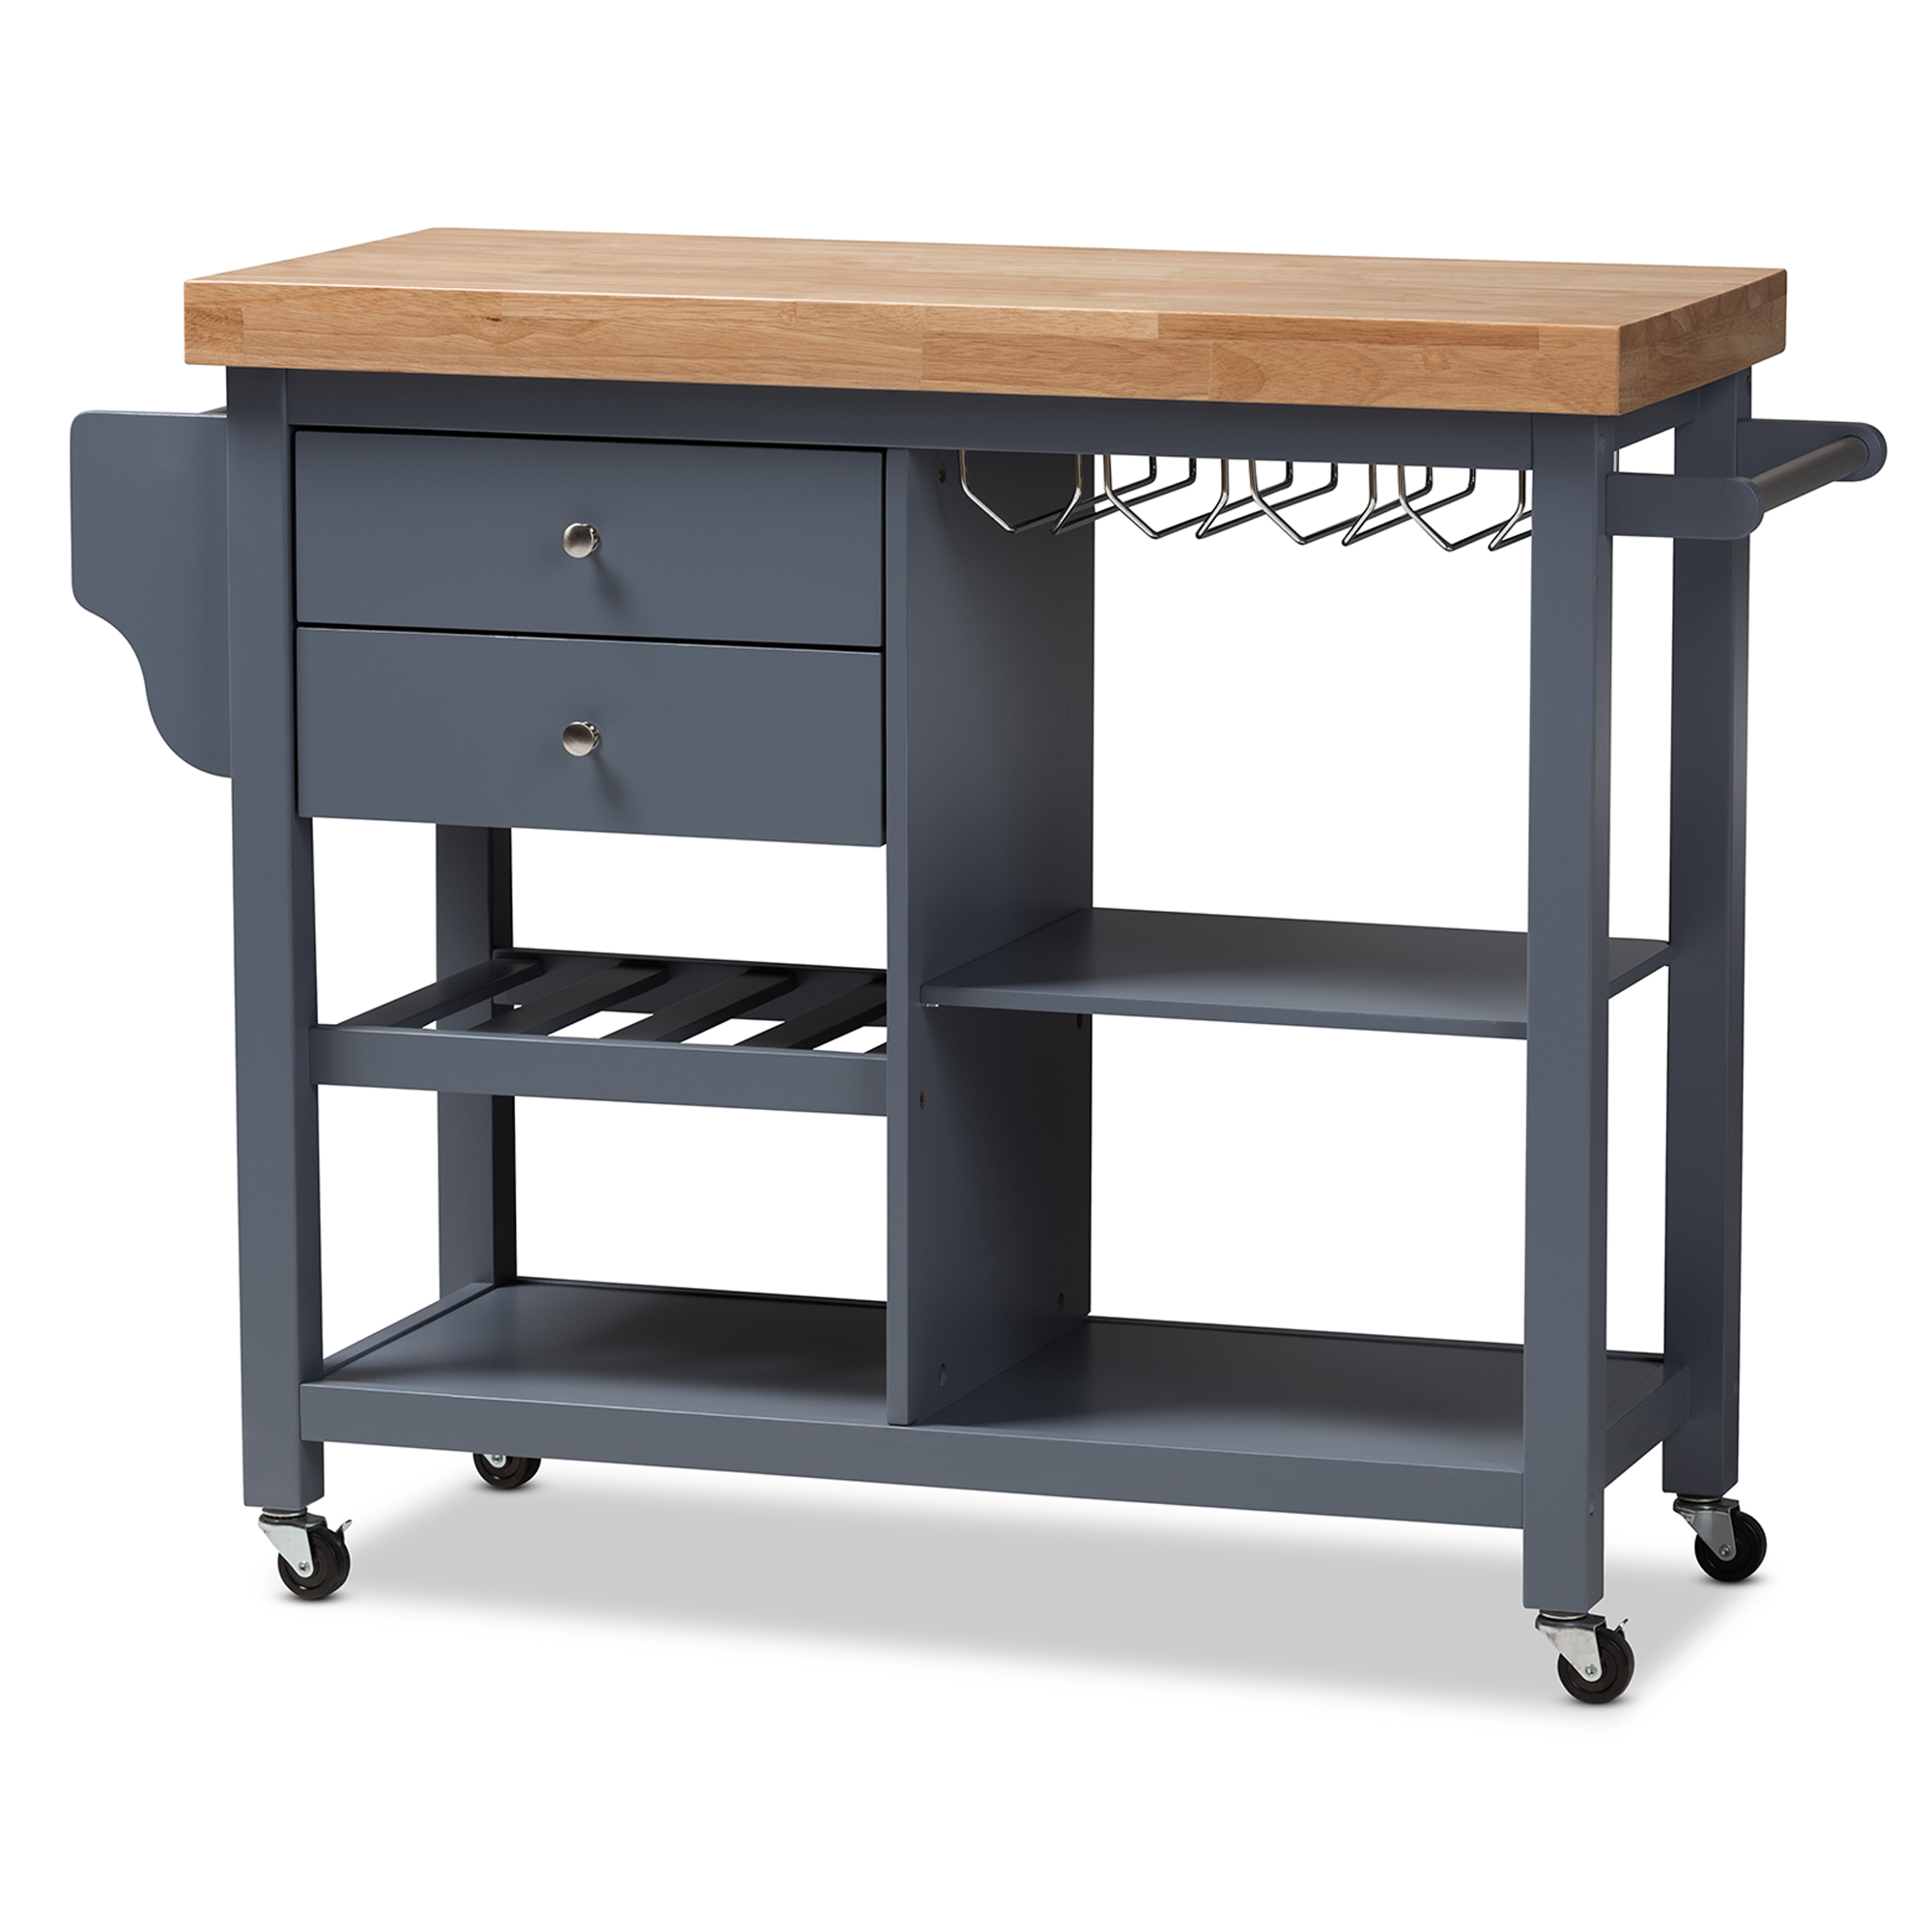 Baxton Studio Sunderland Coastal And Farmhouse Grey Wood Kitchen Cart  Affordable Modern Furniture In Chicago,